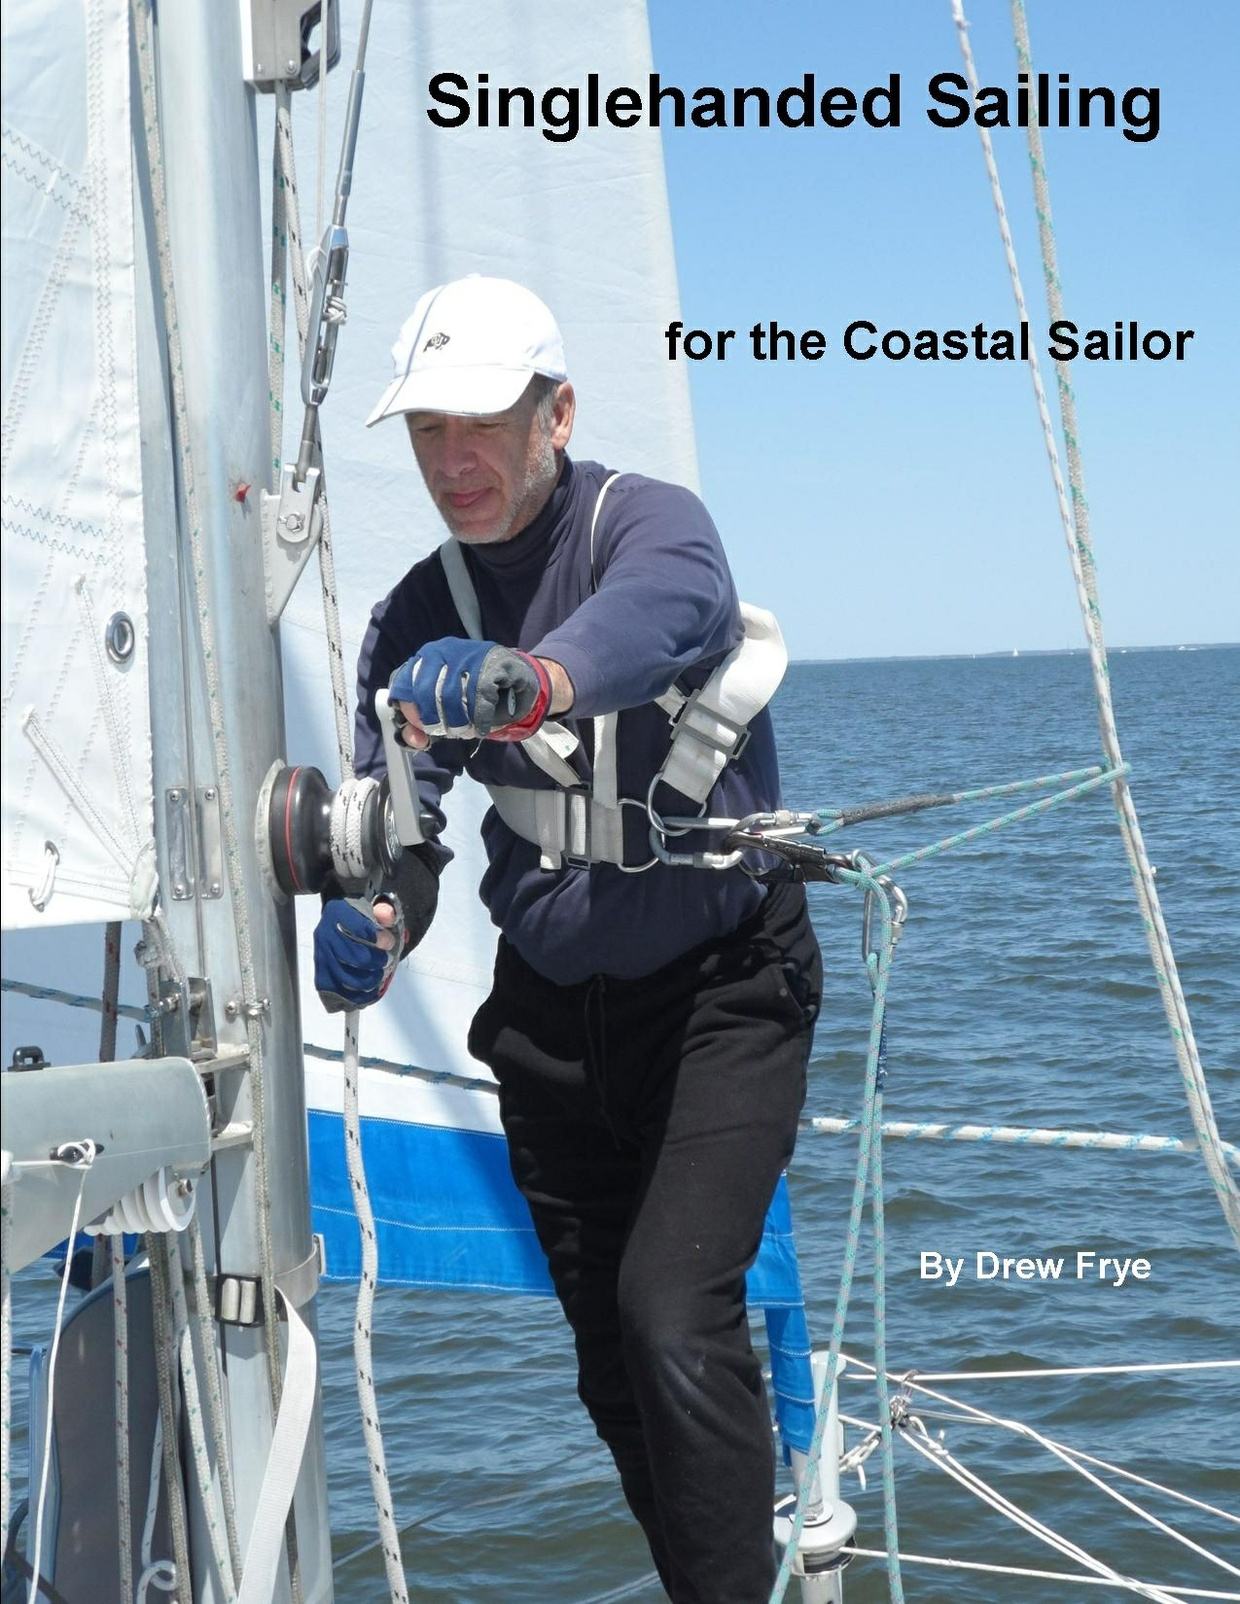 Singlehanded Sailing for the Coastal Sailor